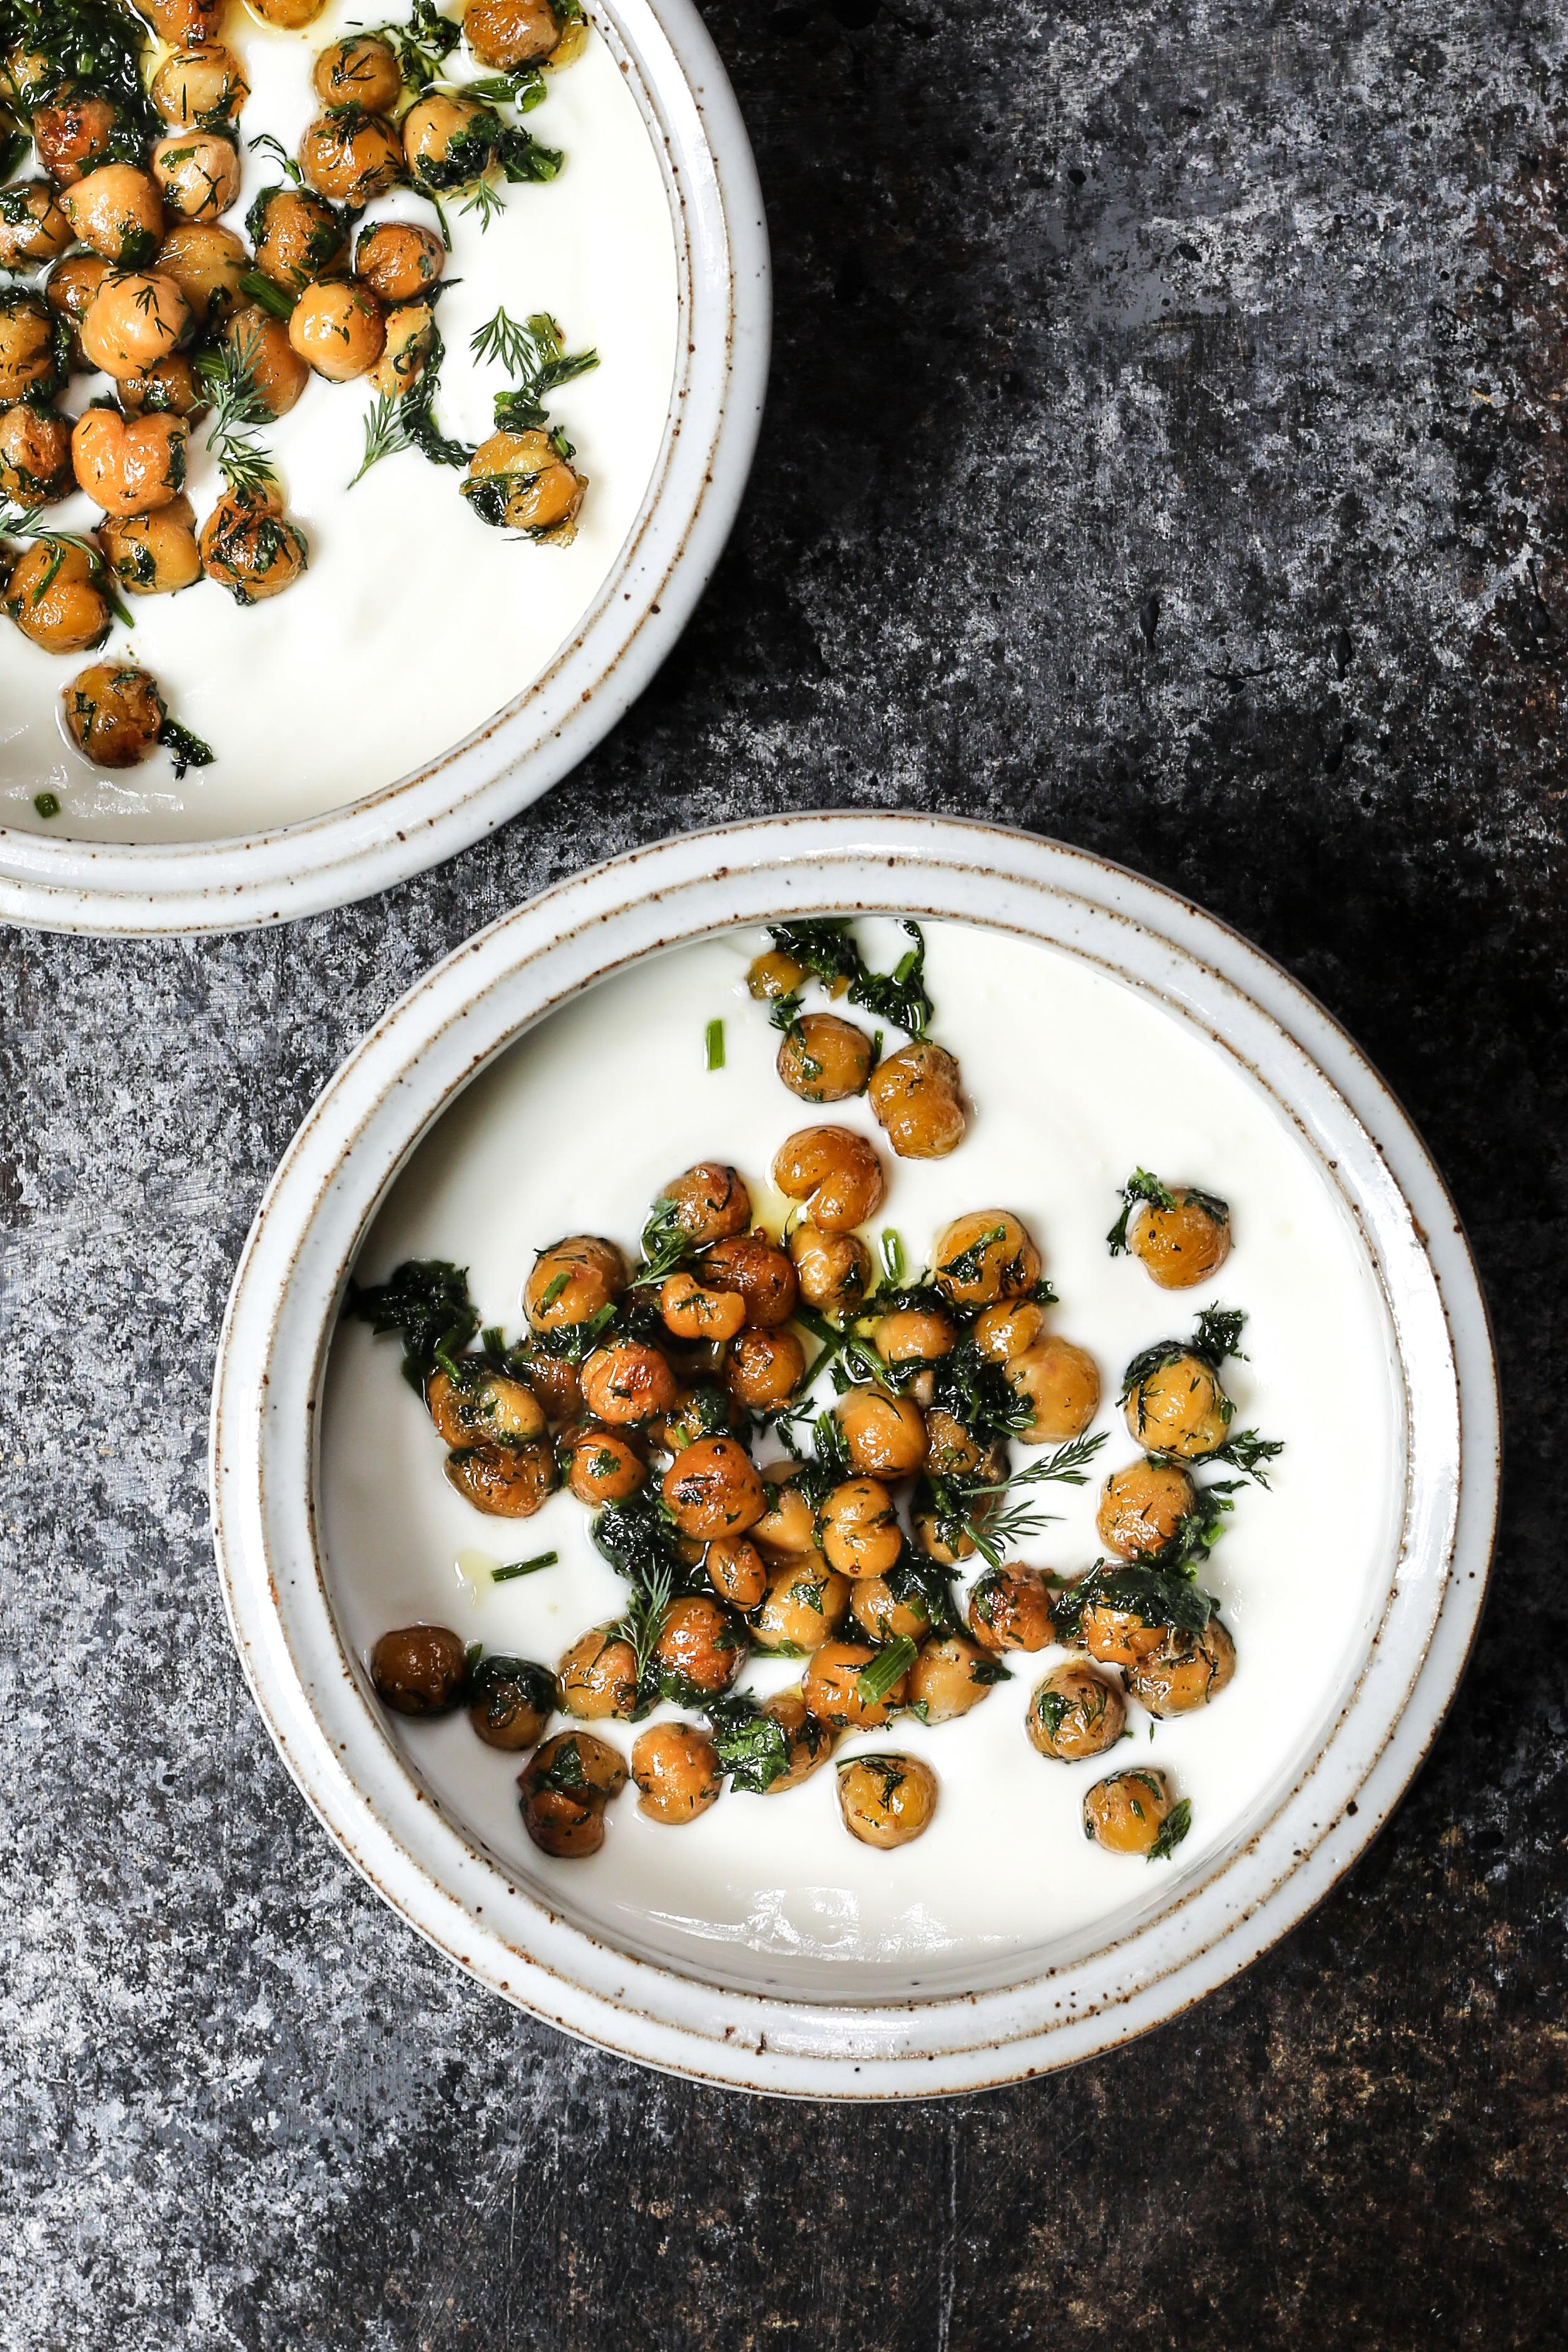 Herbed Chickpeas with Yogurt